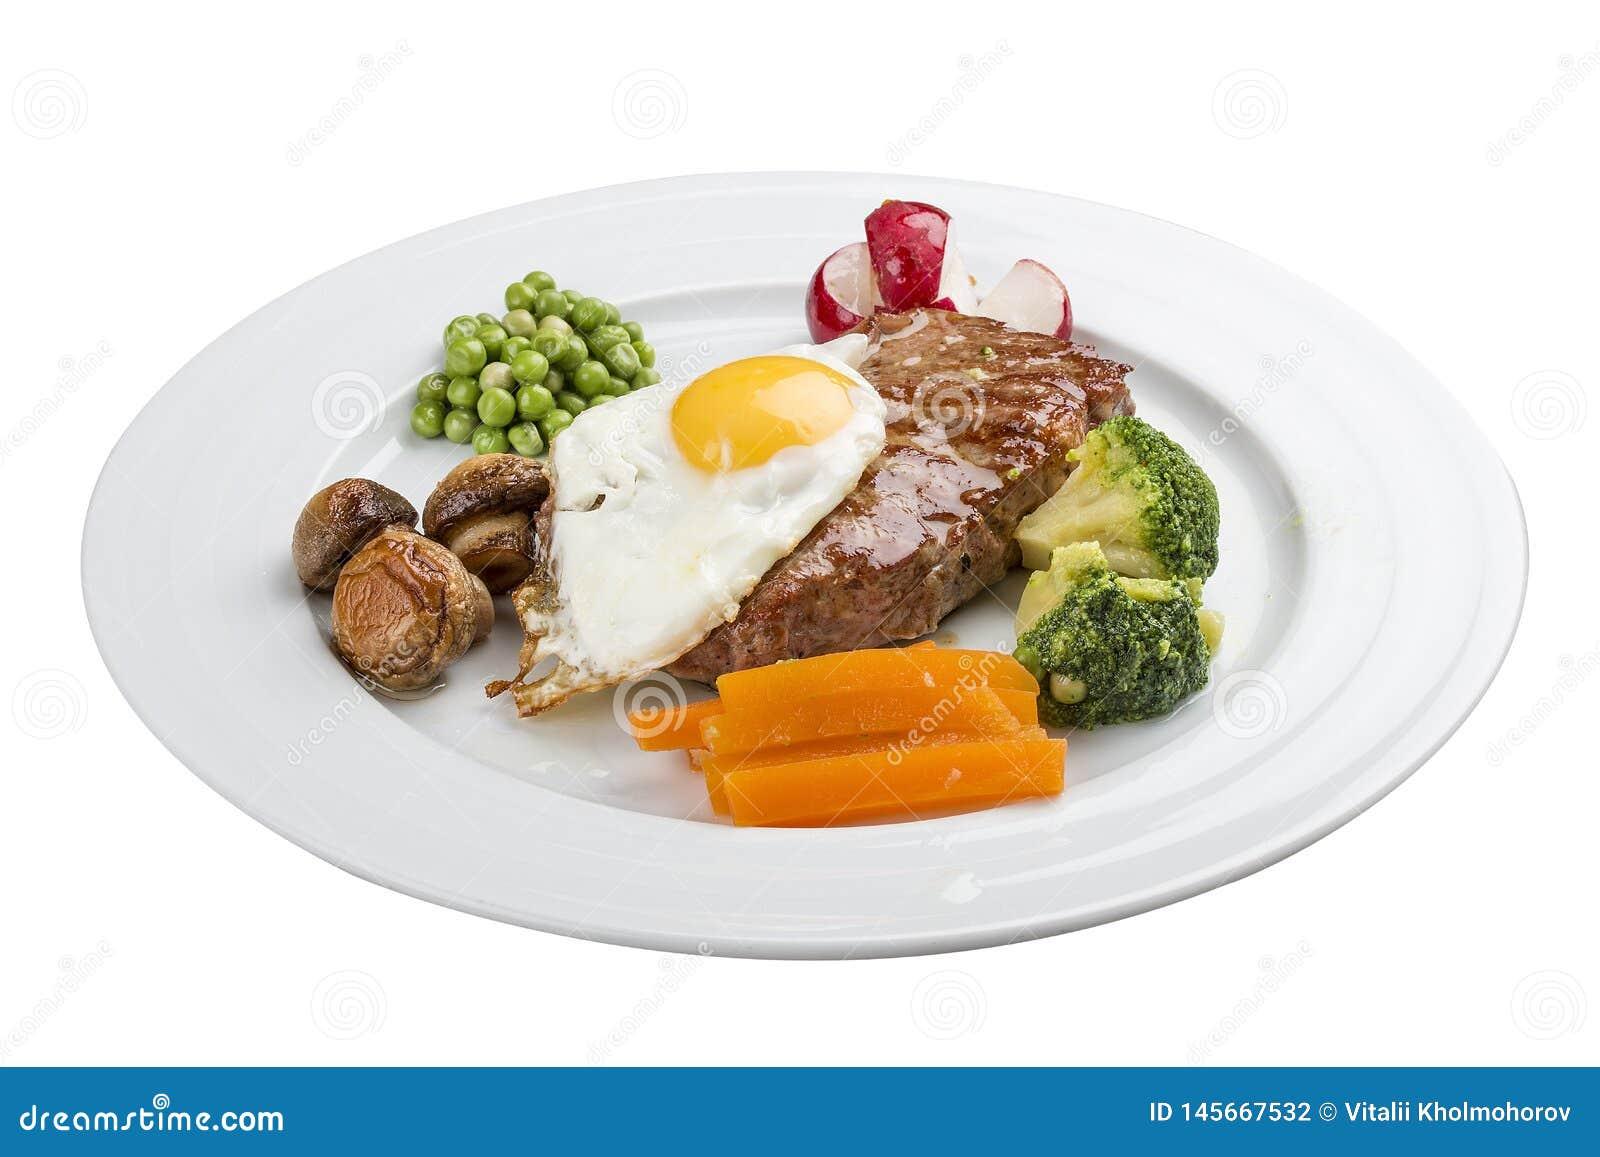 Usual breakfast. Steak, egg and vegetables.